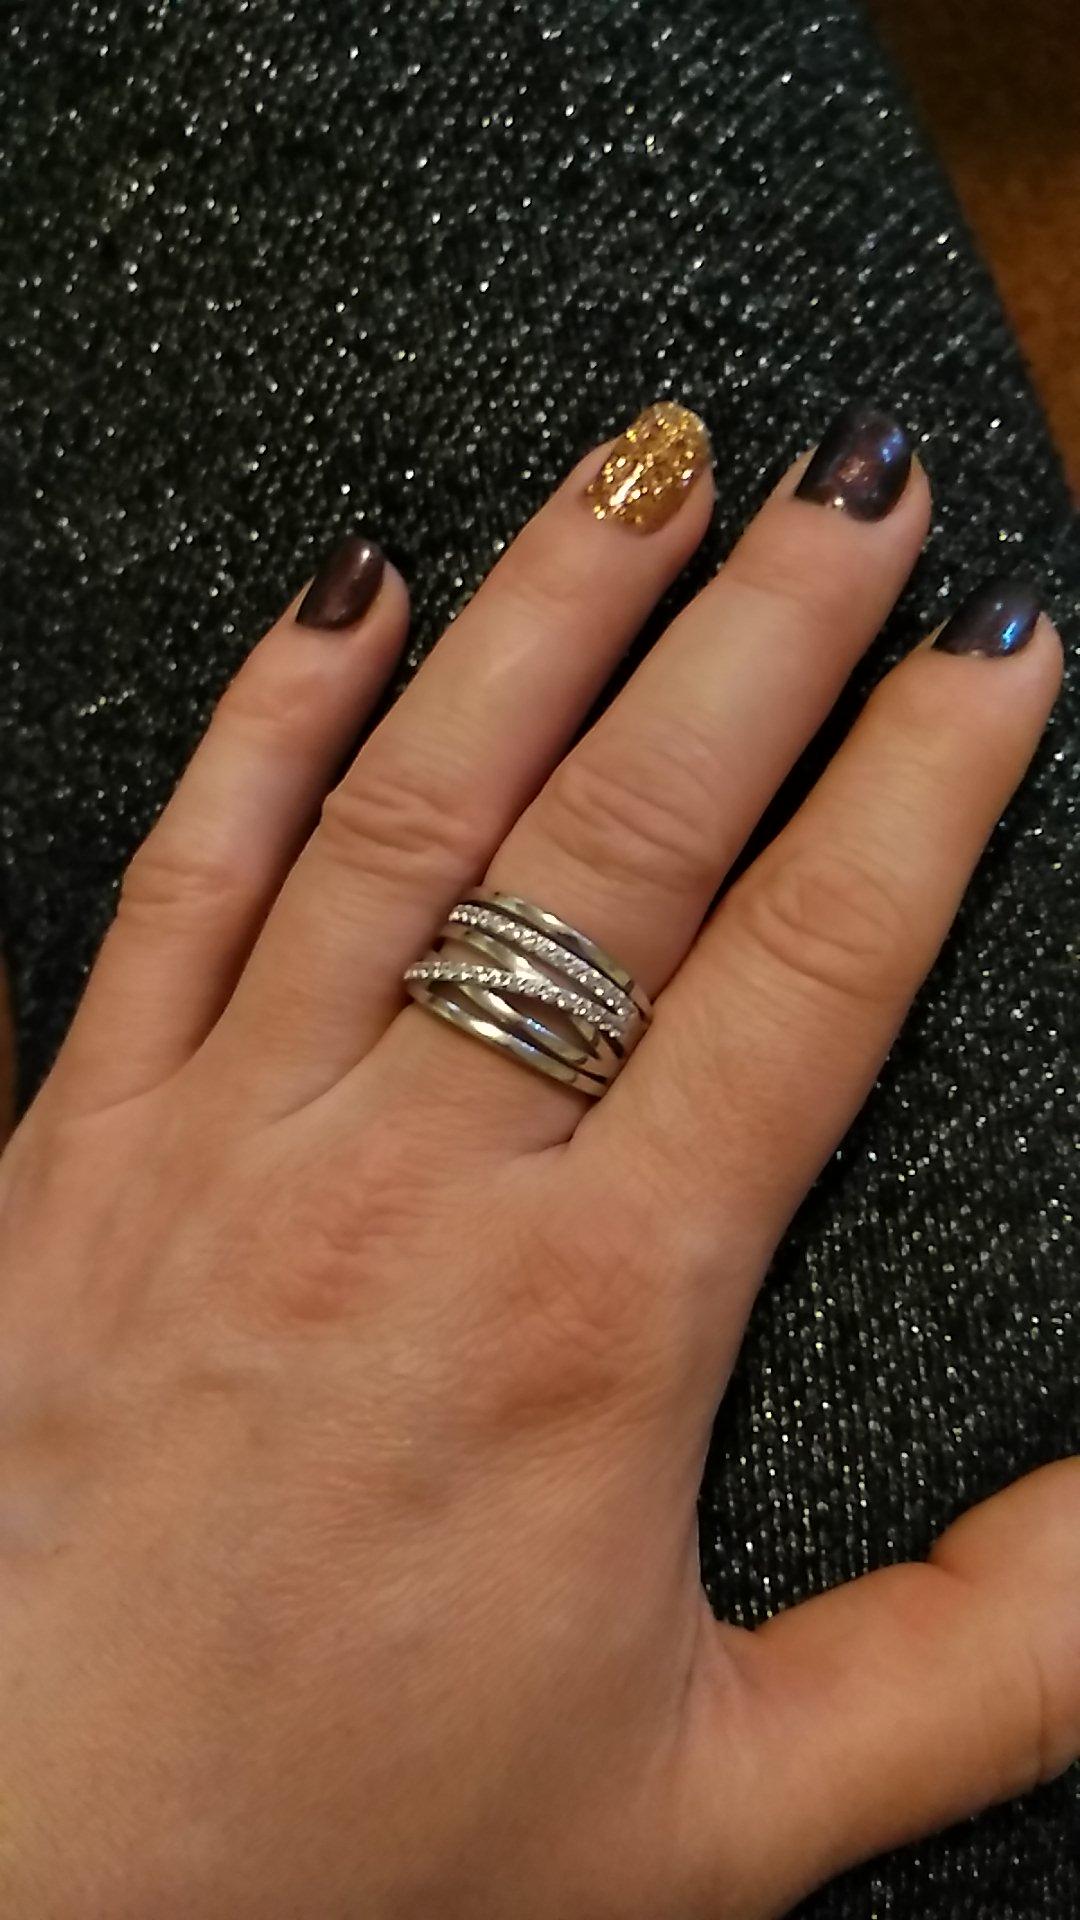 Клевое кольцо!!!